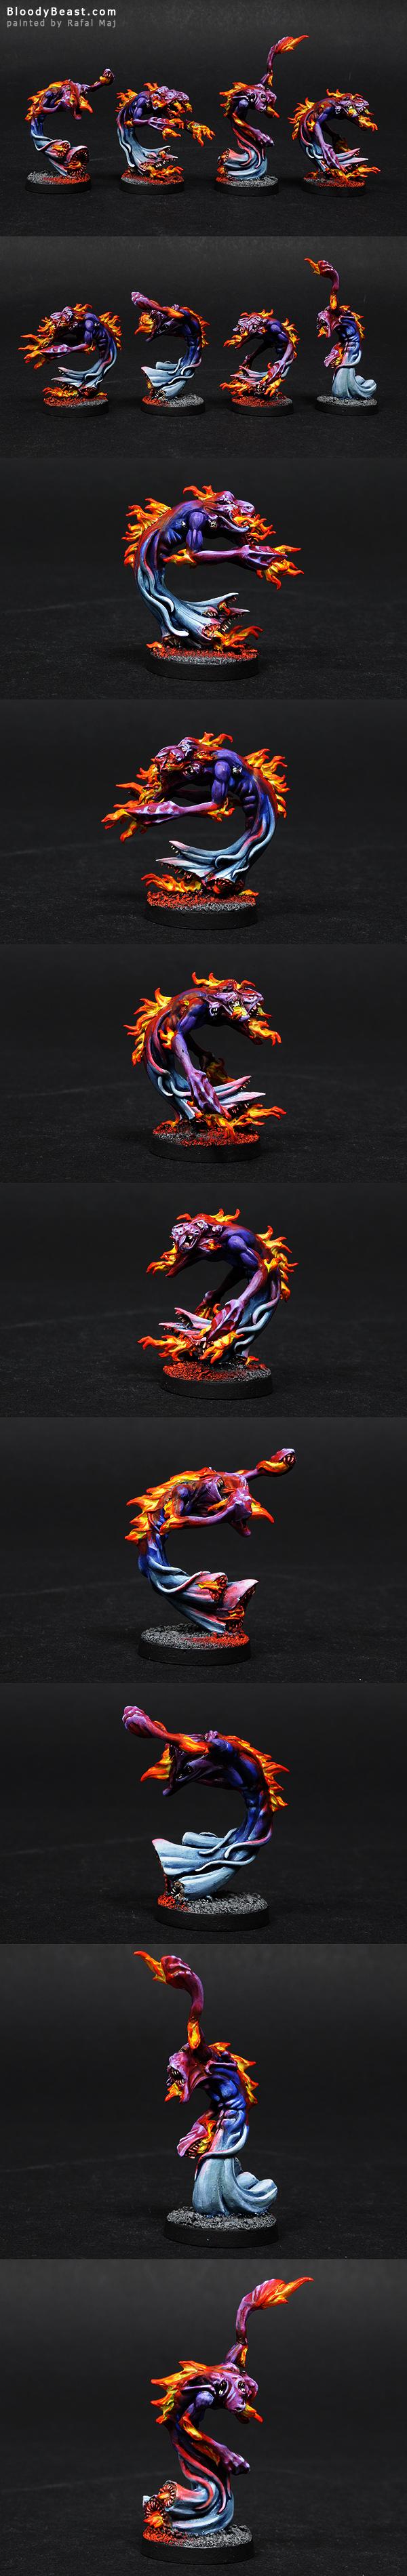 Flamers of Tzeentch painted by Rafal Maj (BloodyBeast.com)